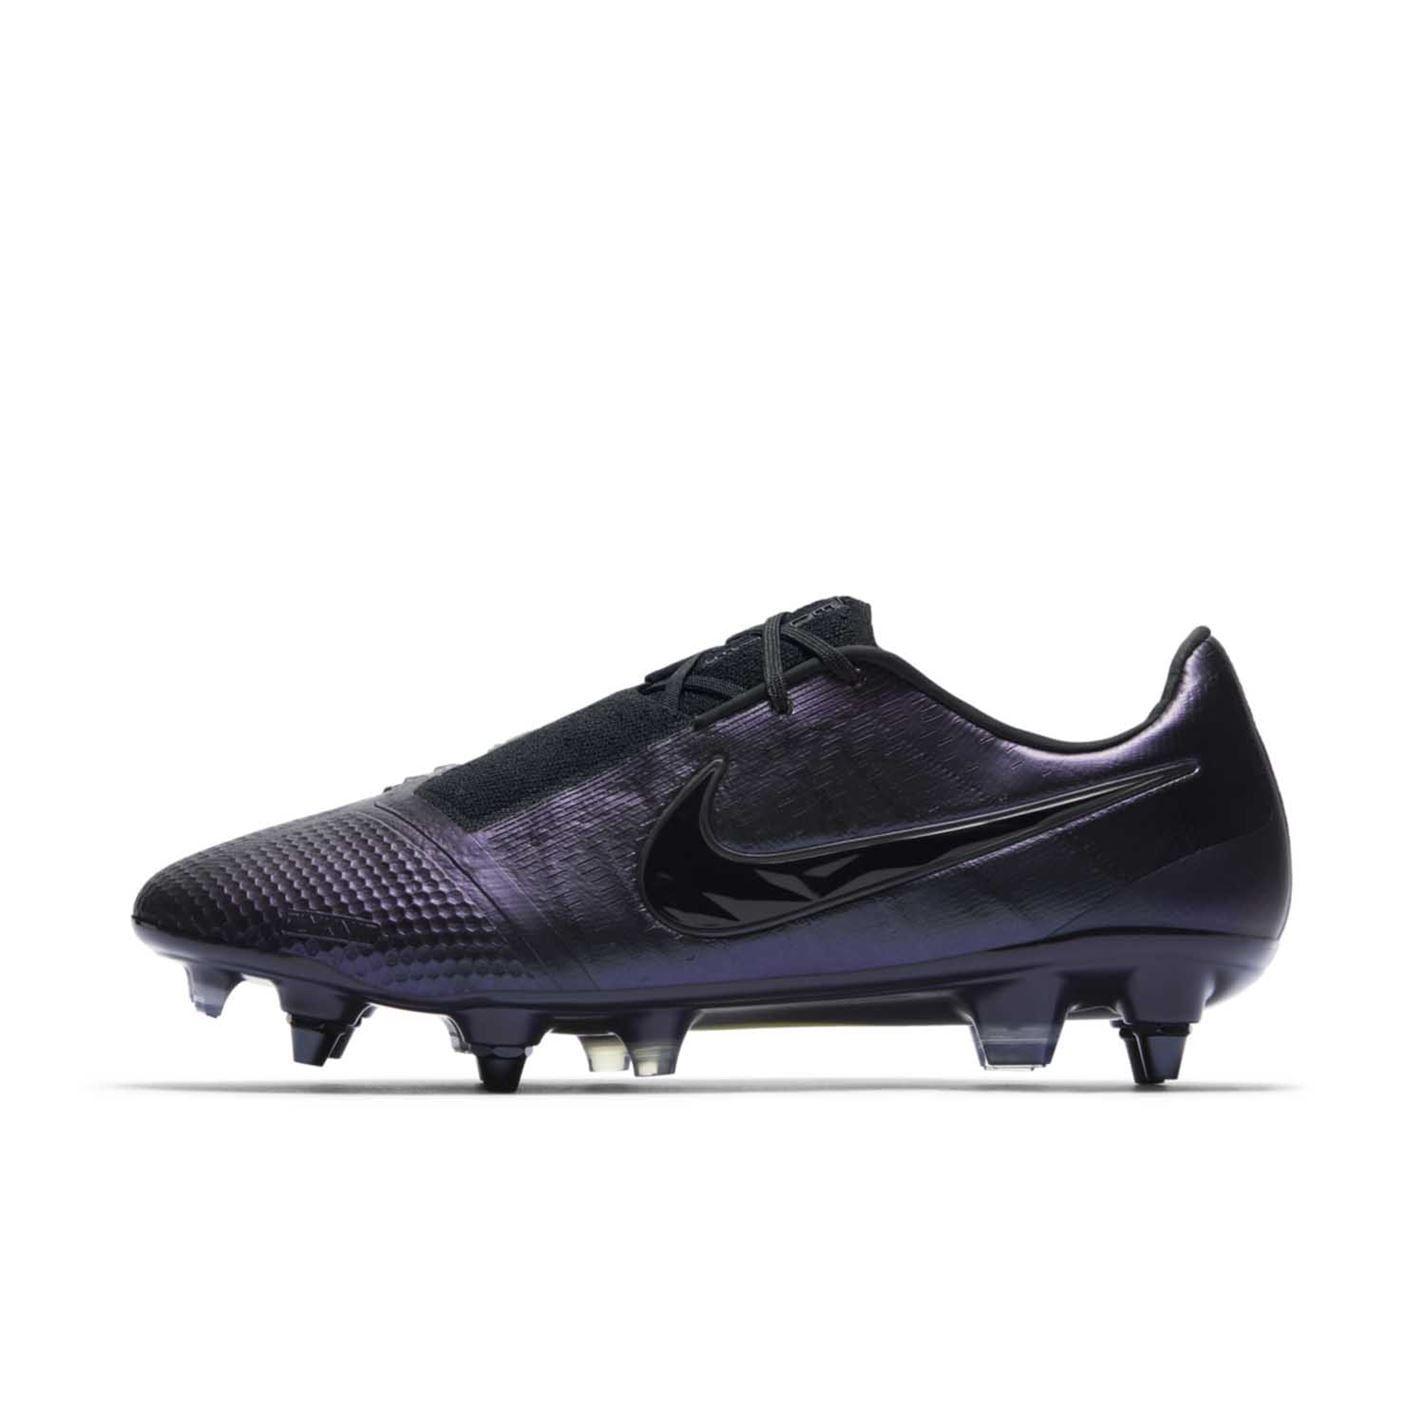 Nike-Phantom-Venom-Elite-Homme-SG-Terrain-Souple-Chaussures-De-Football-Chaussures-de-foot-crampons miniature 3